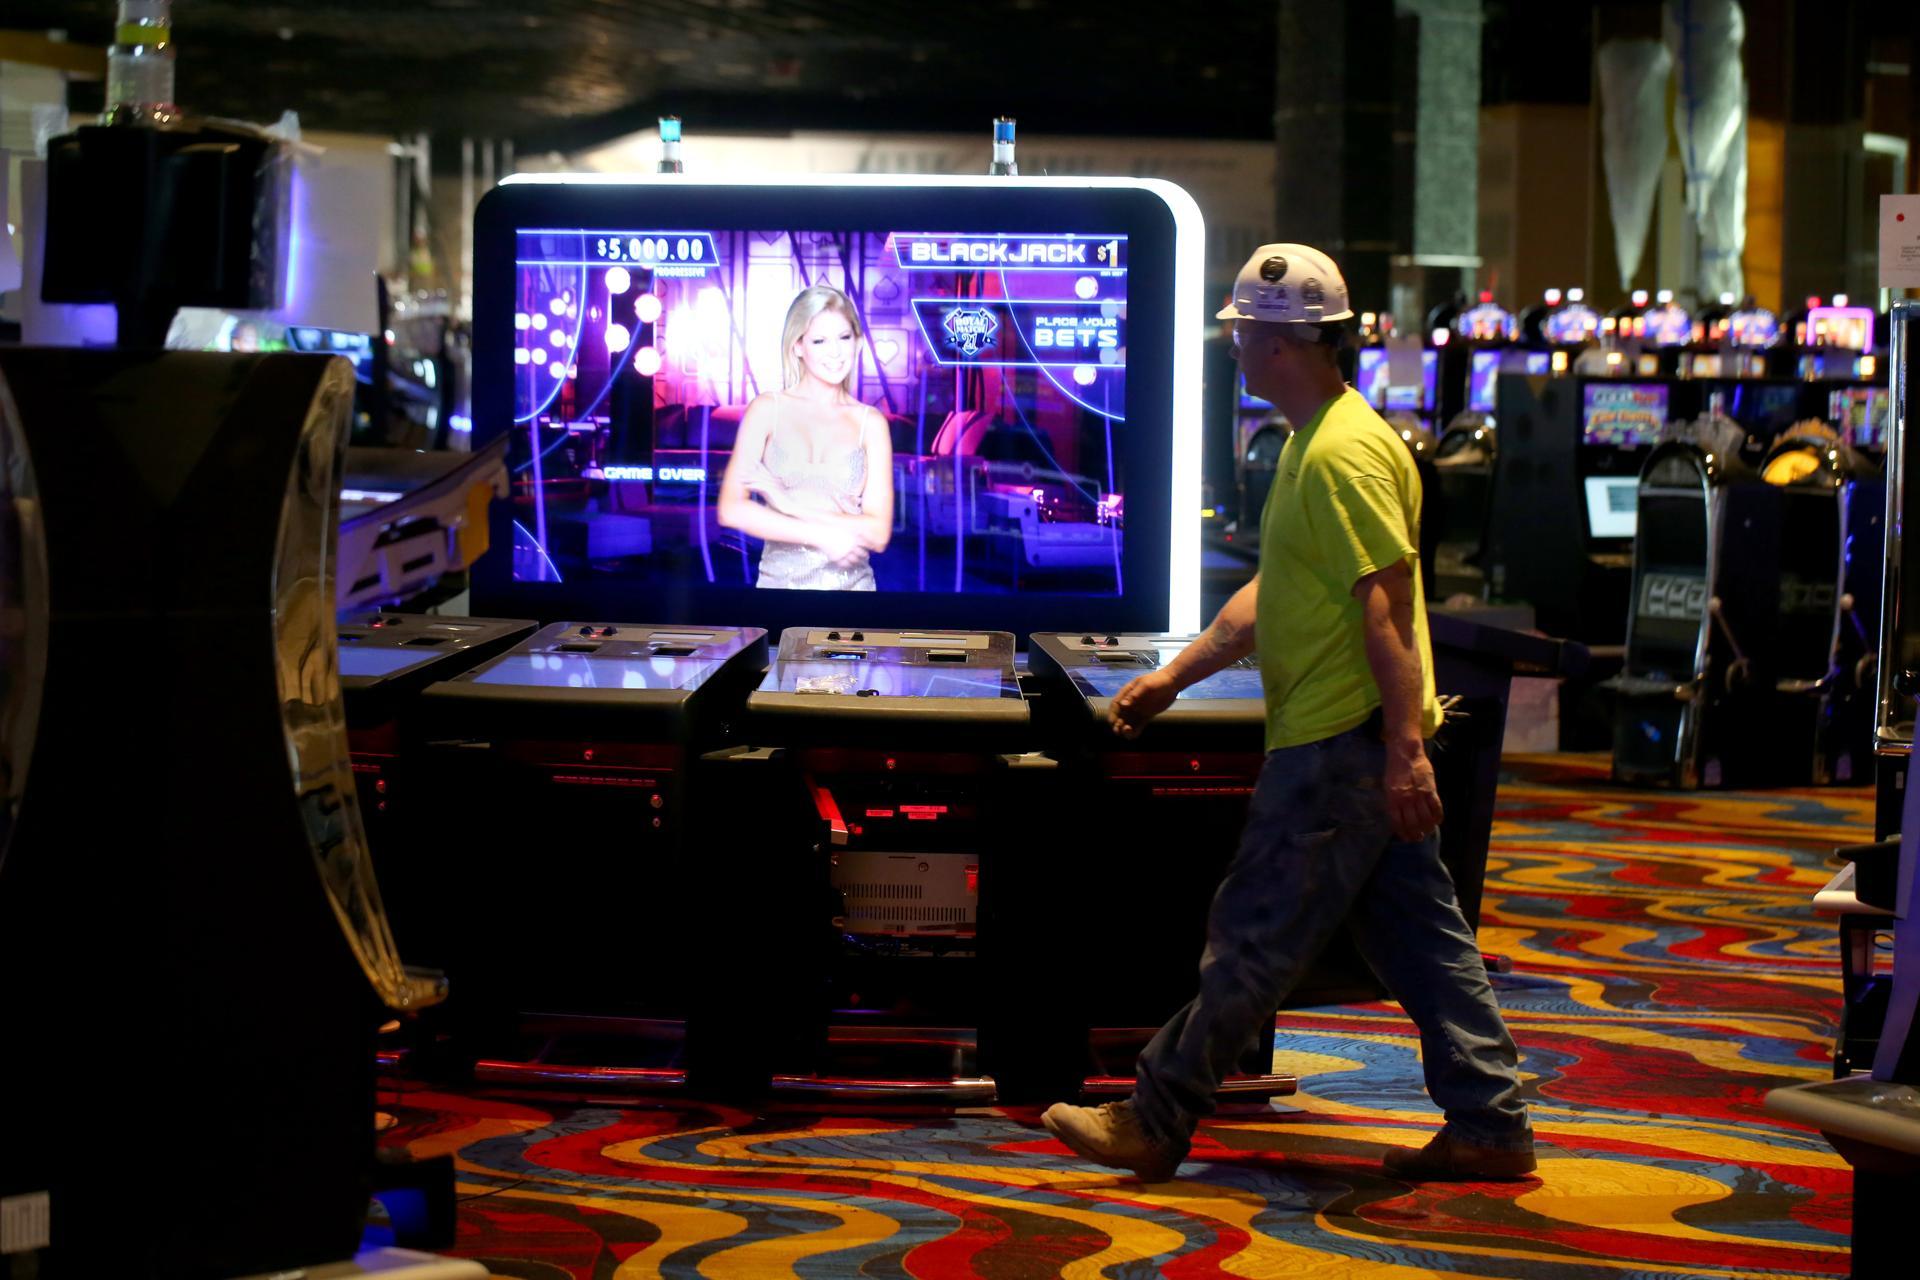 Casino electronic games online gambling gambling com internet online